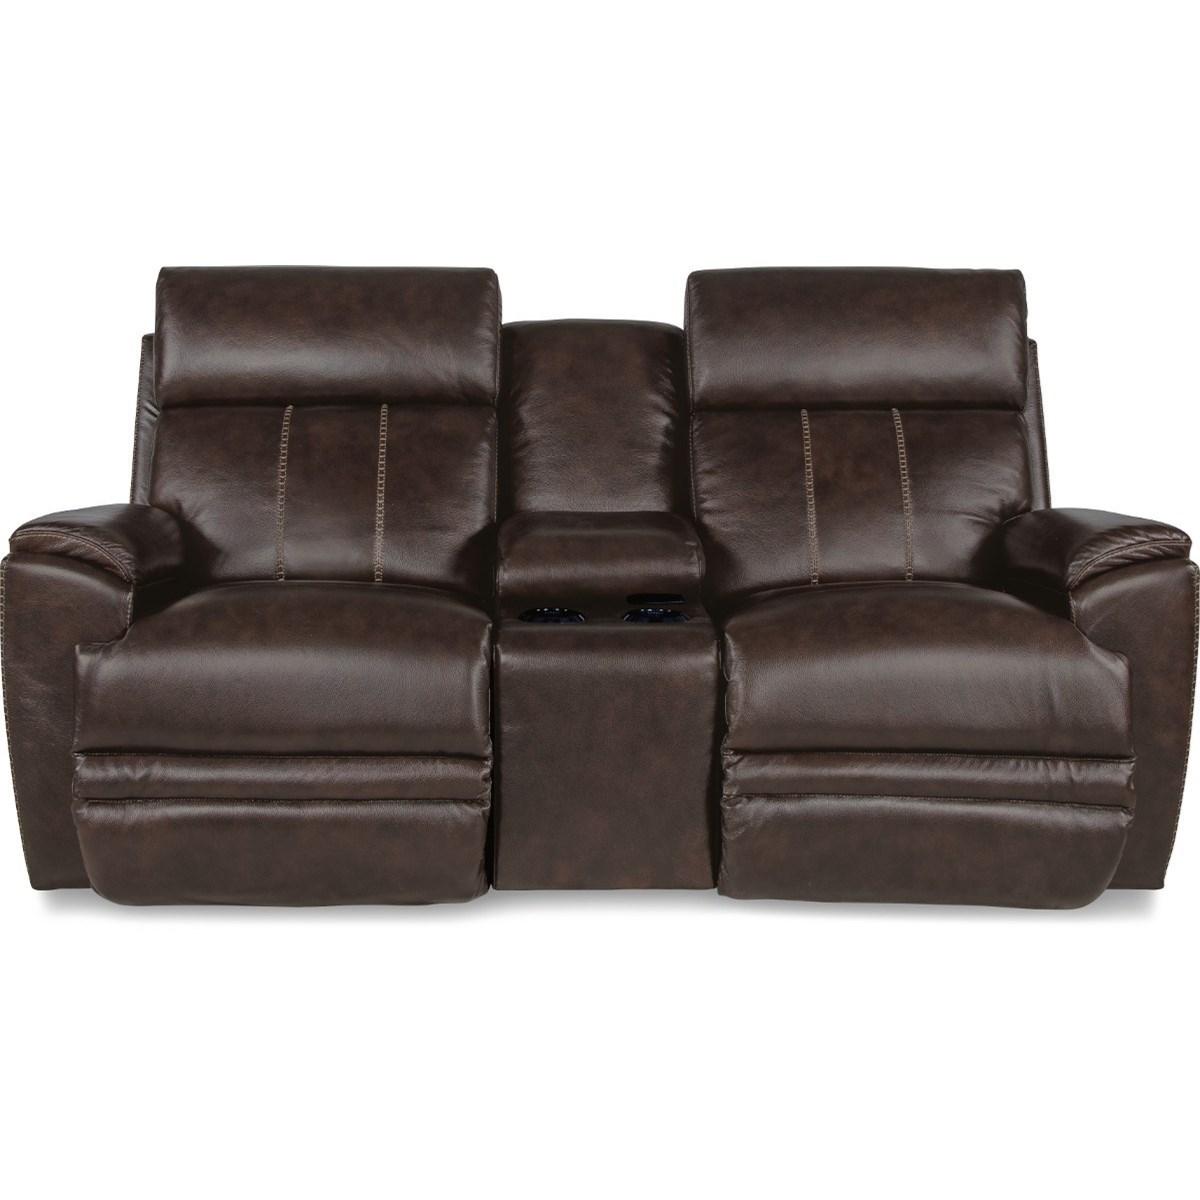 Talladega Pwr Recline Loveseat w/ Console and Headrest by La-Z-Boy at Walker's Furniture